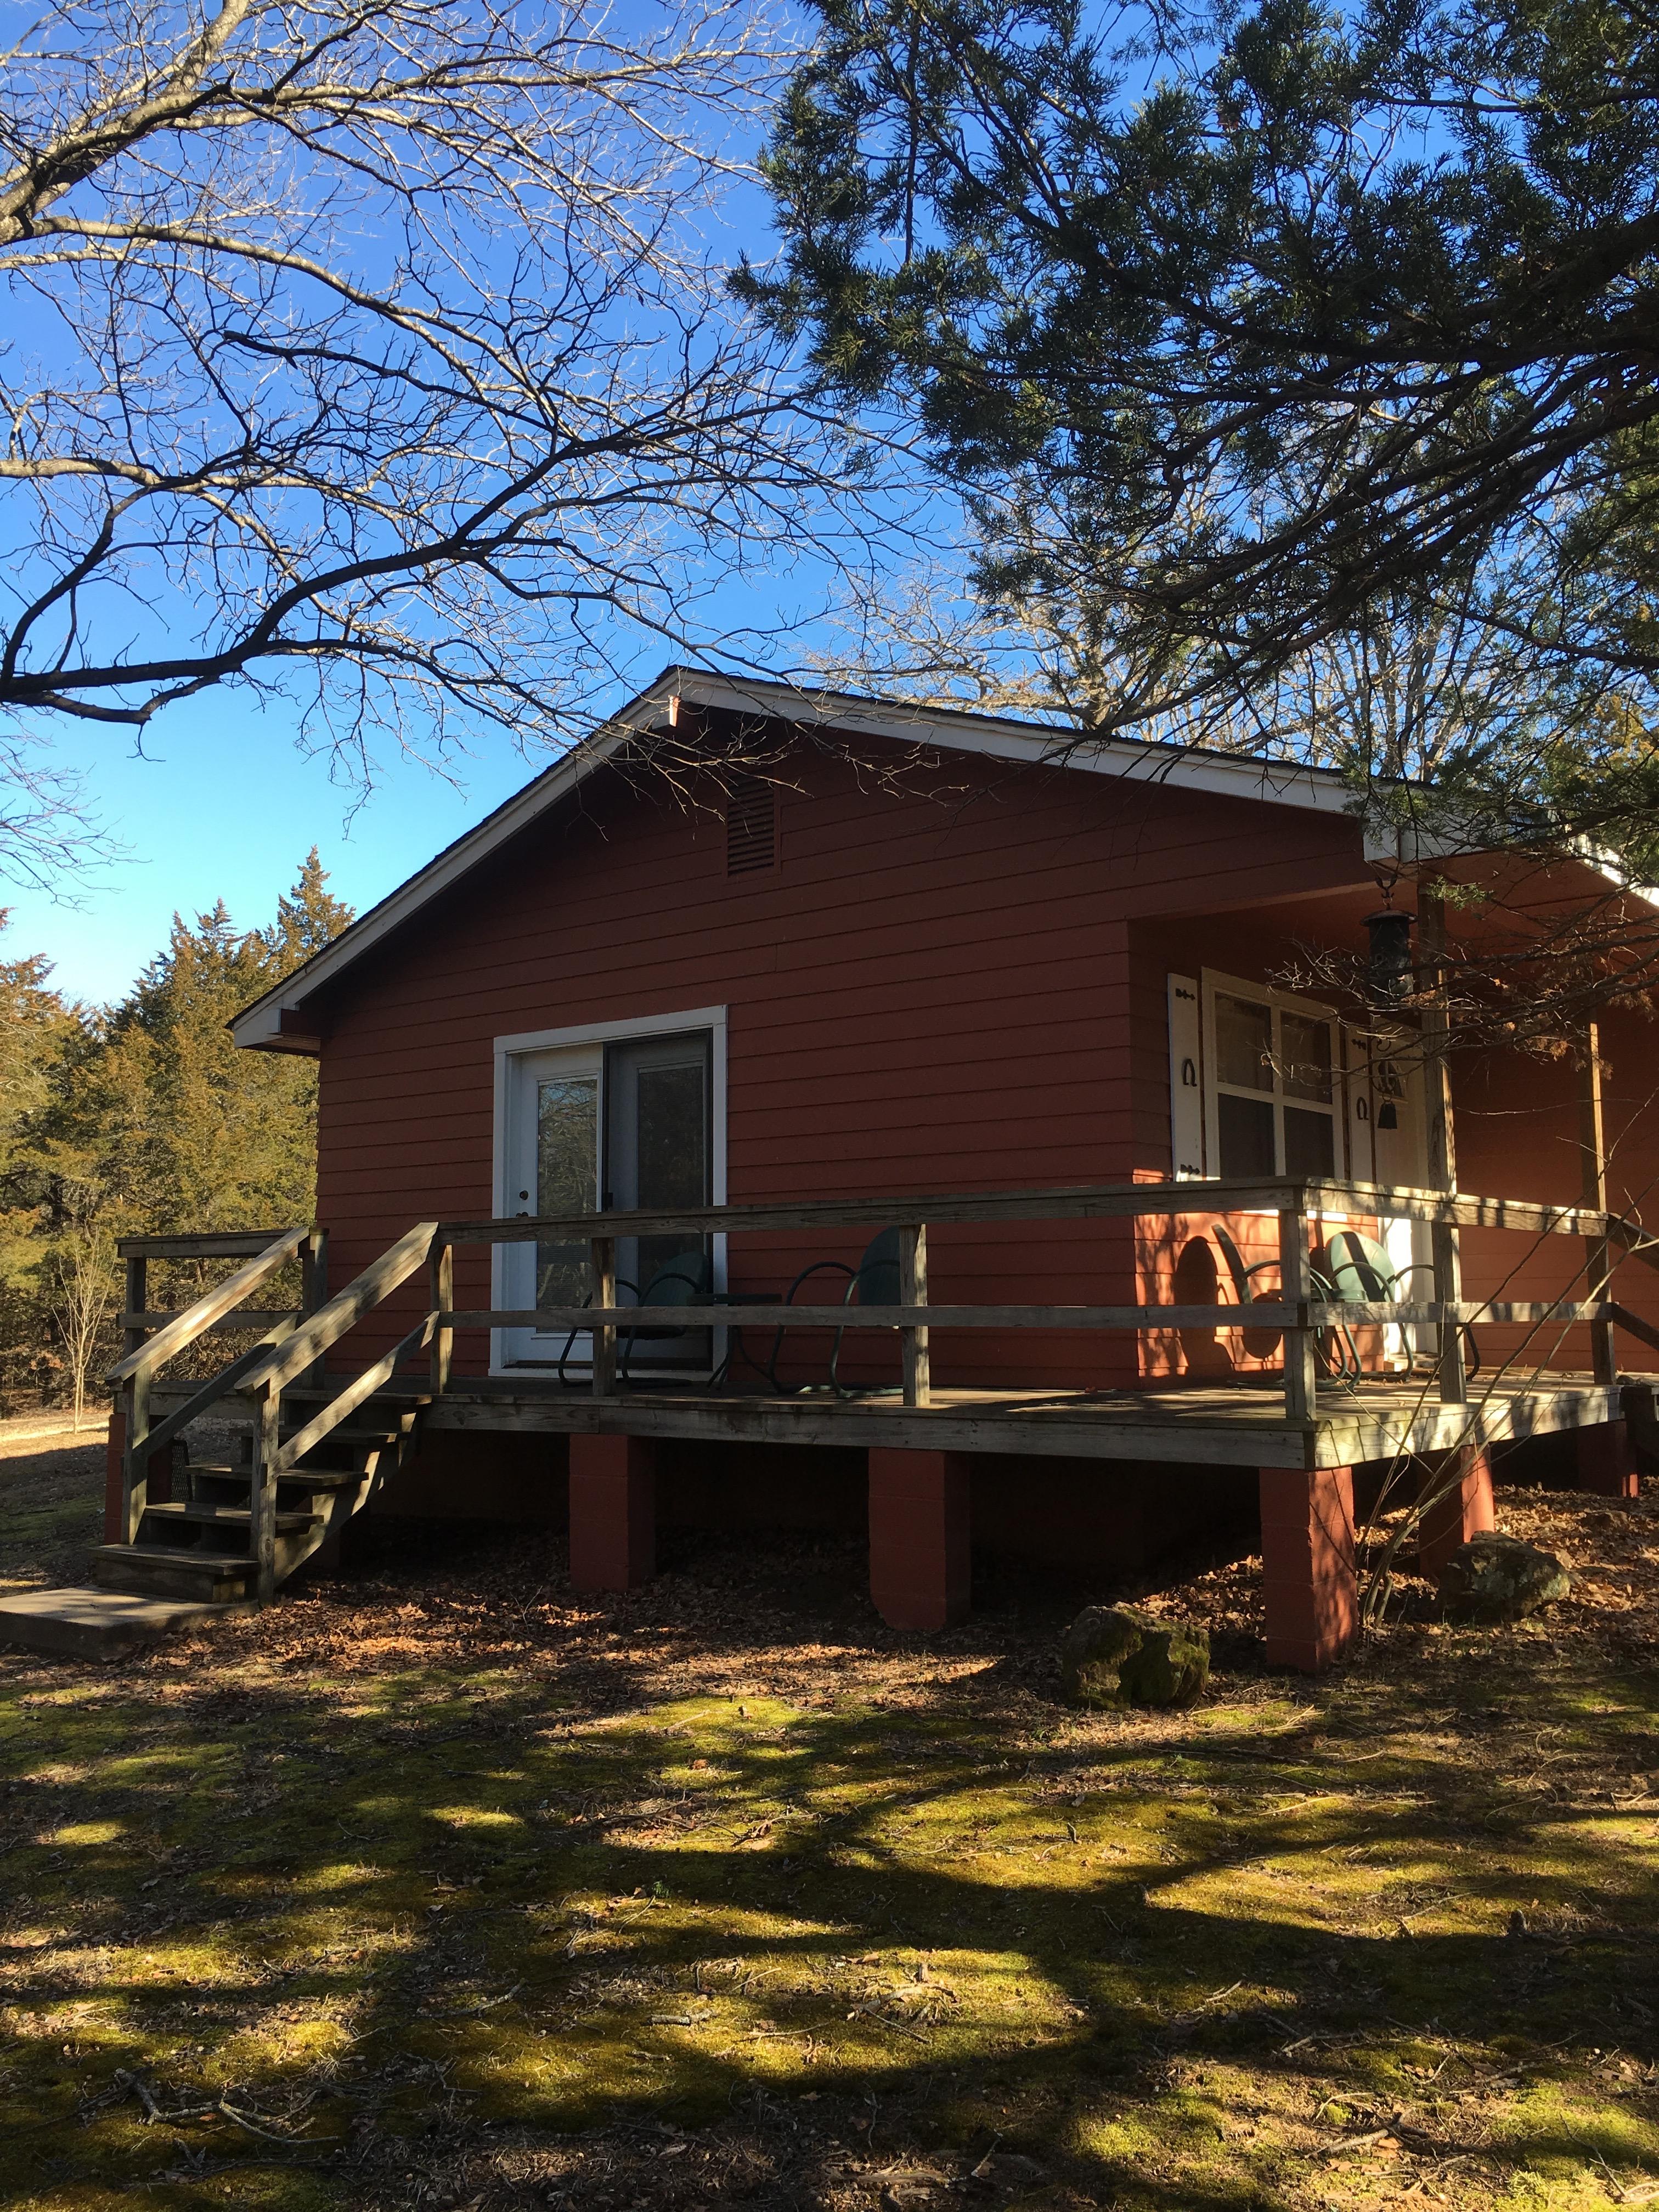 St. Bonaventure Cabin